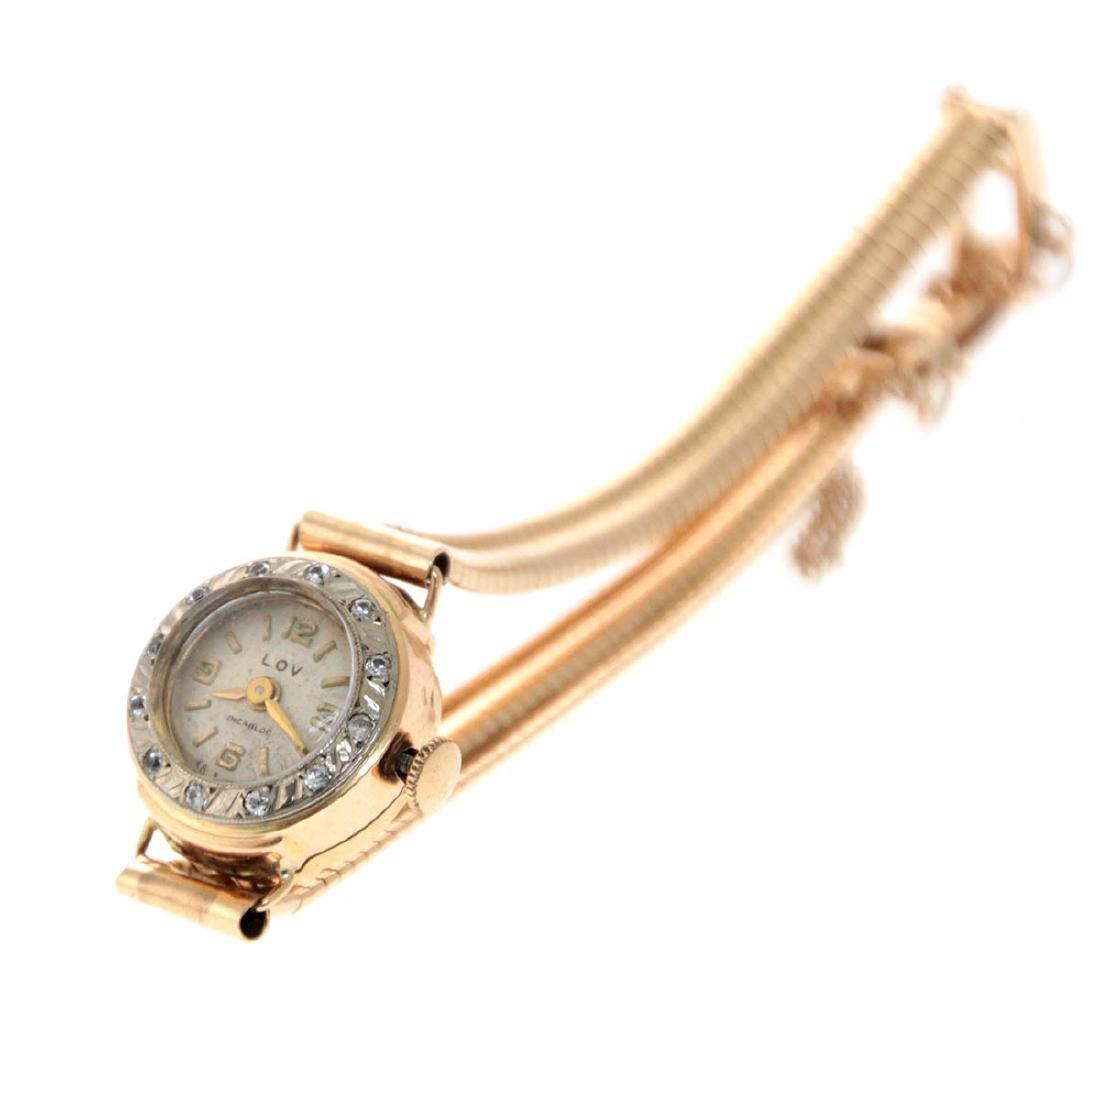 Lov Gold Wrist Watch.